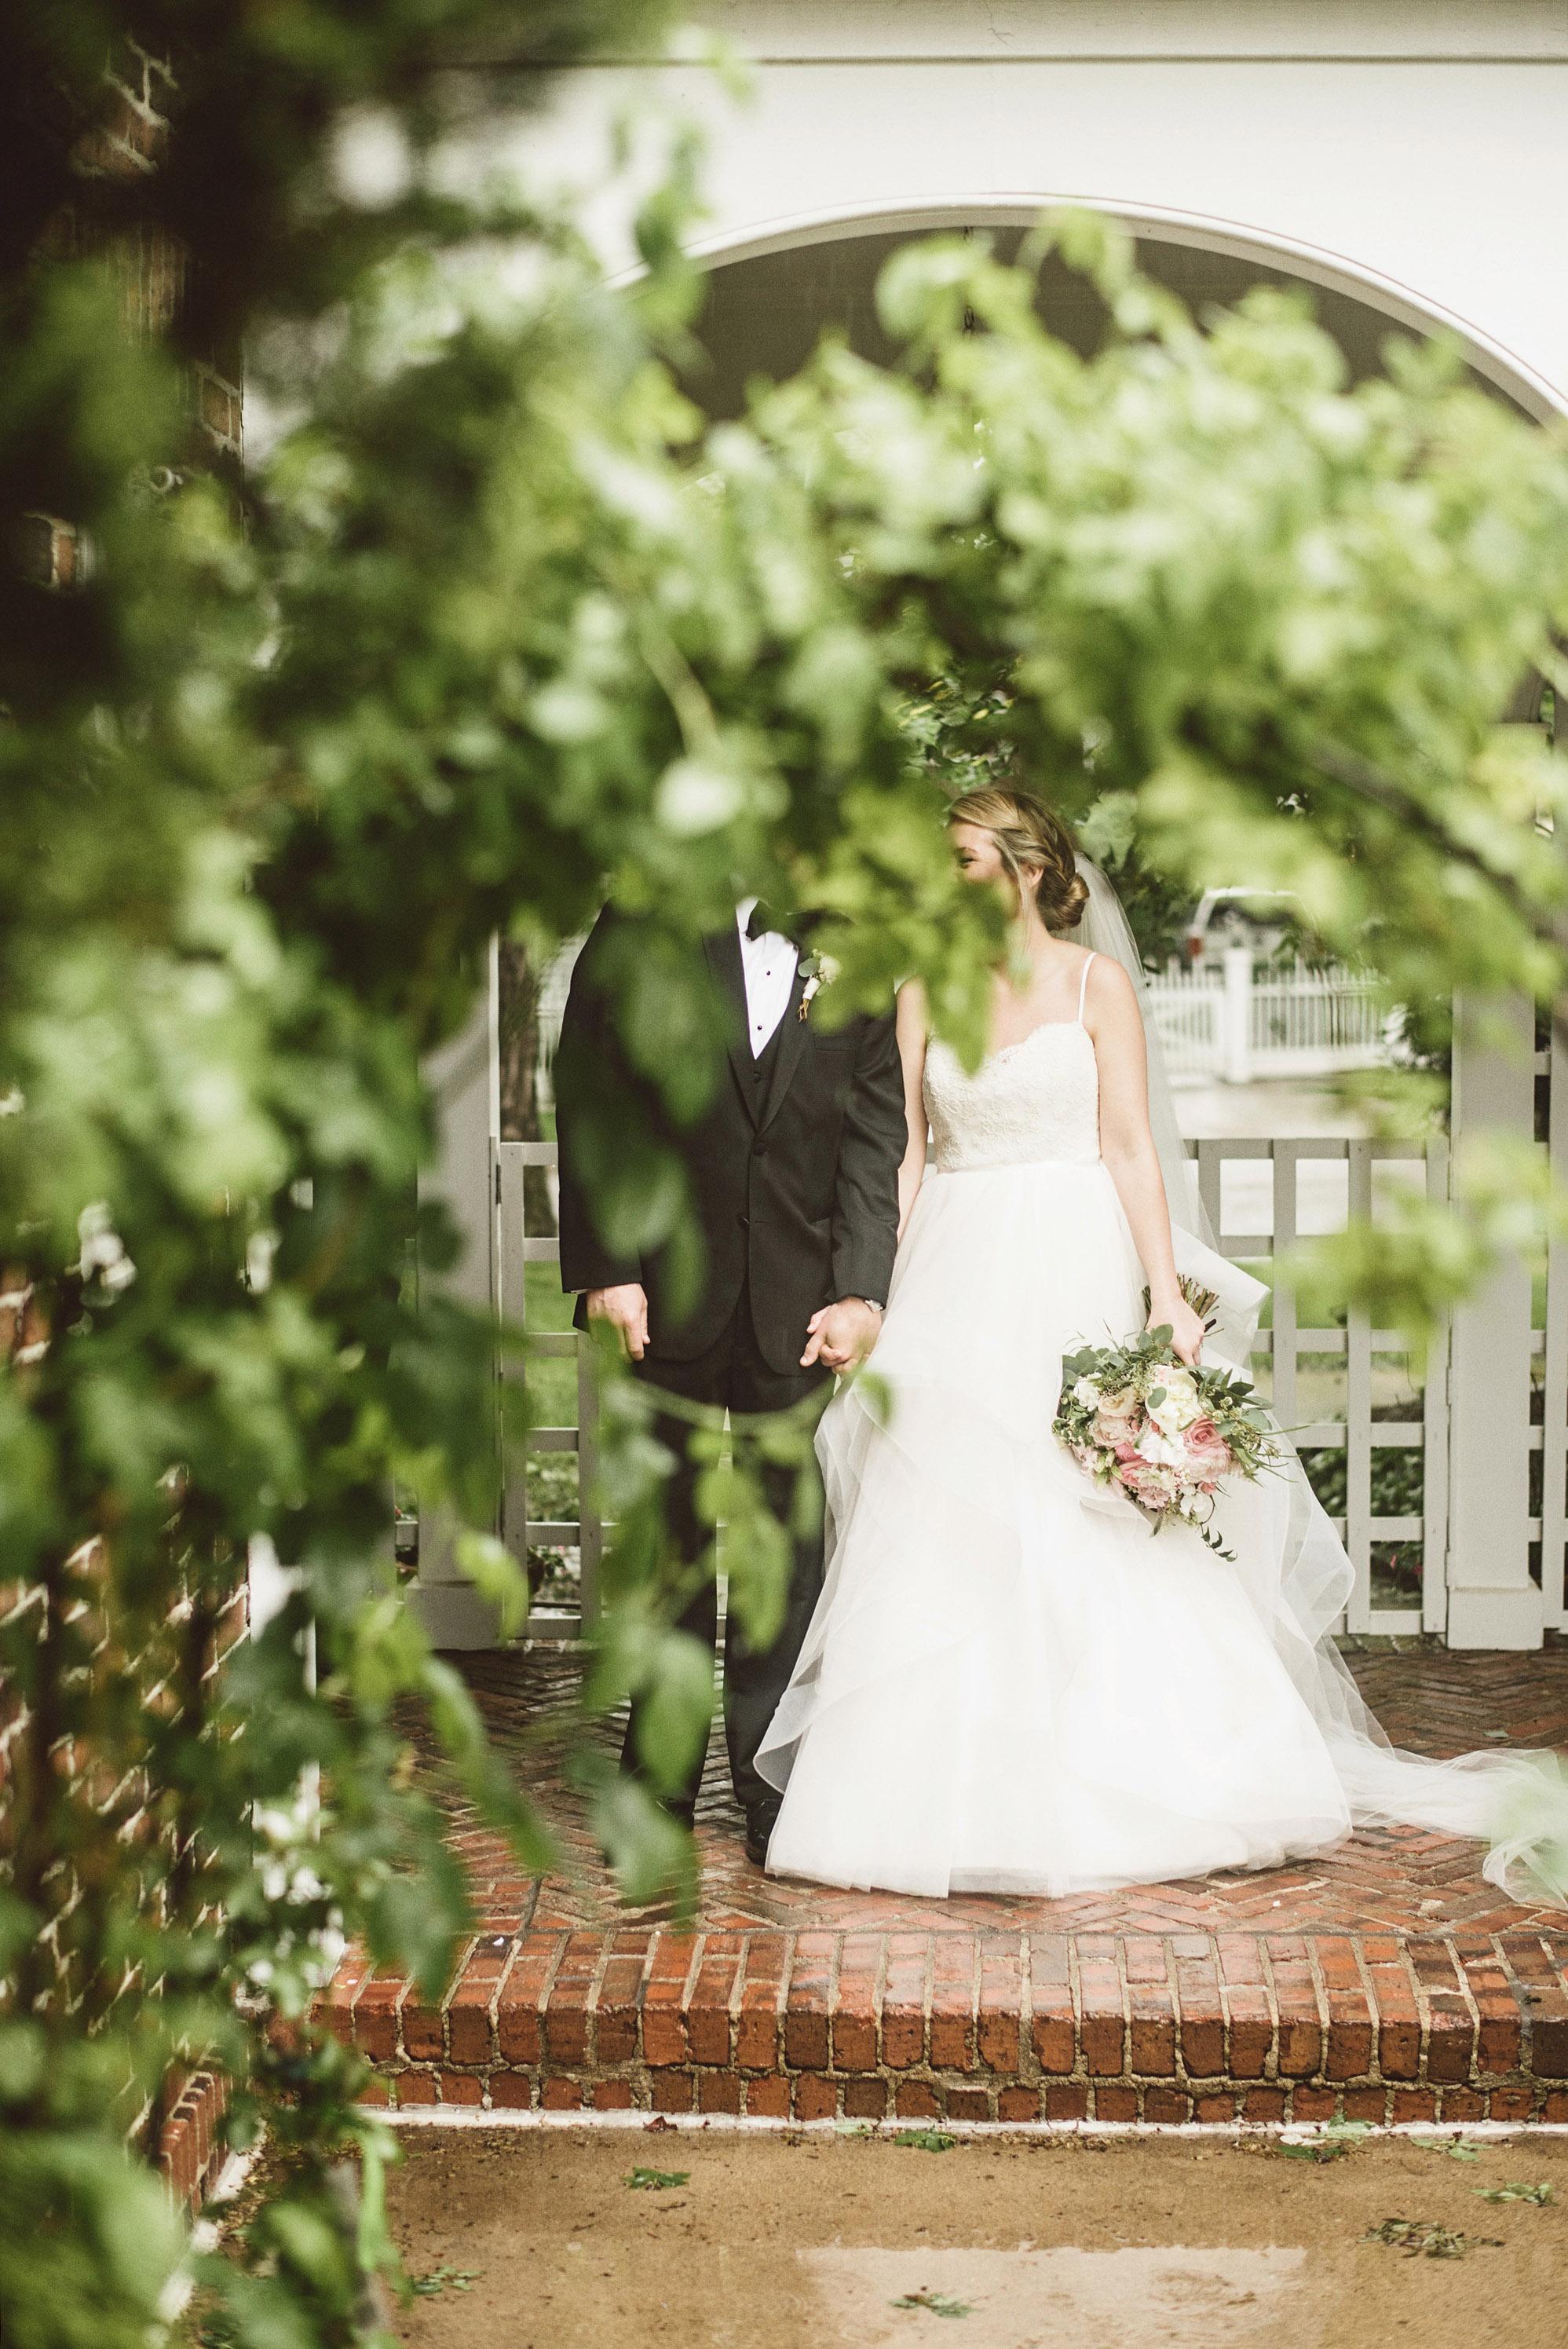 best_wedding_photography_2017_by_lucas_botz_photography_046.jpg